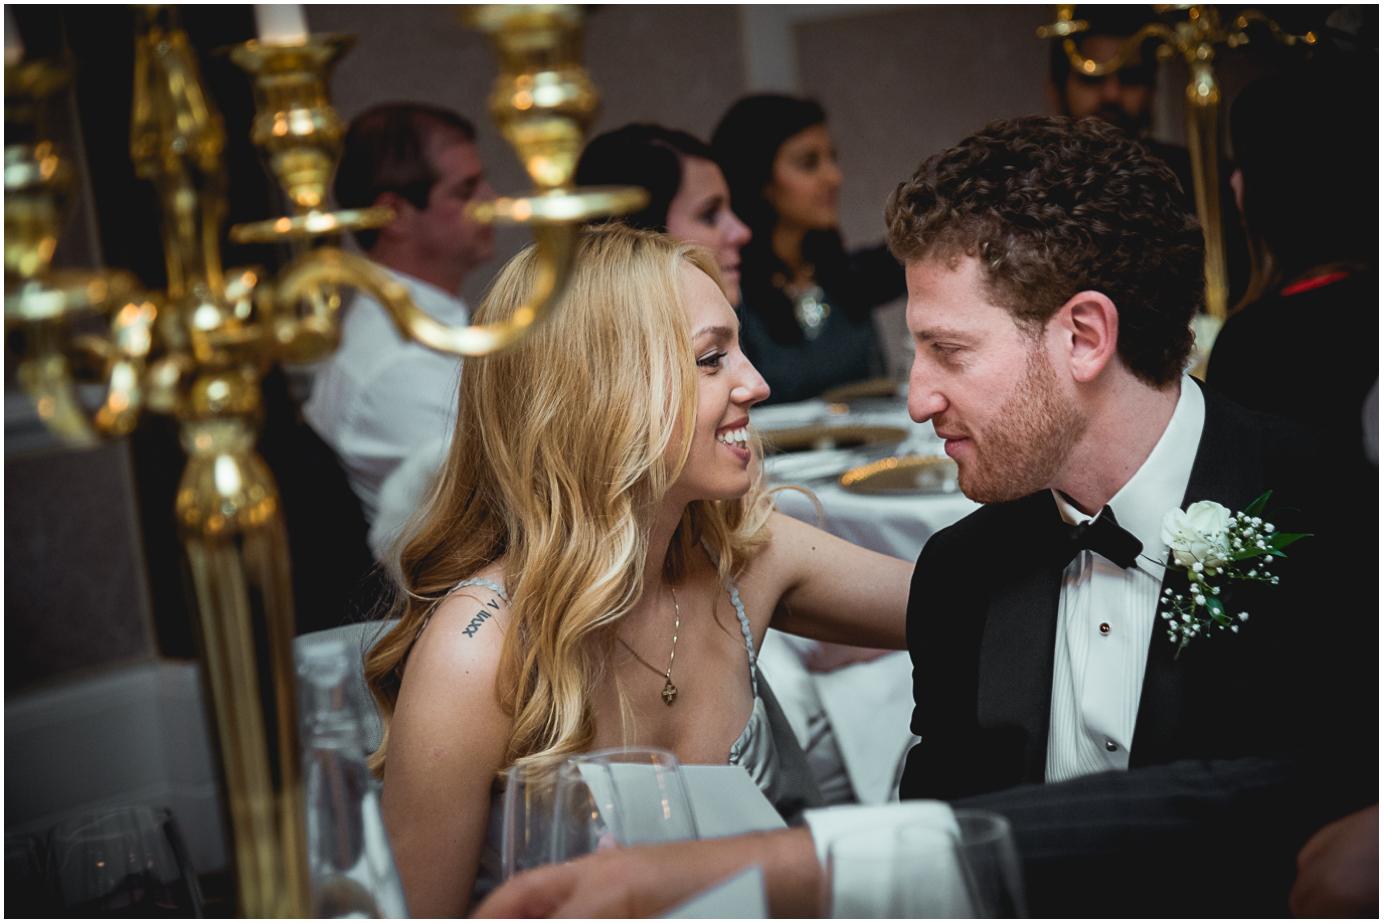 58 - Esmat and Angus - St. Ermin's Hotel London wedding photographer